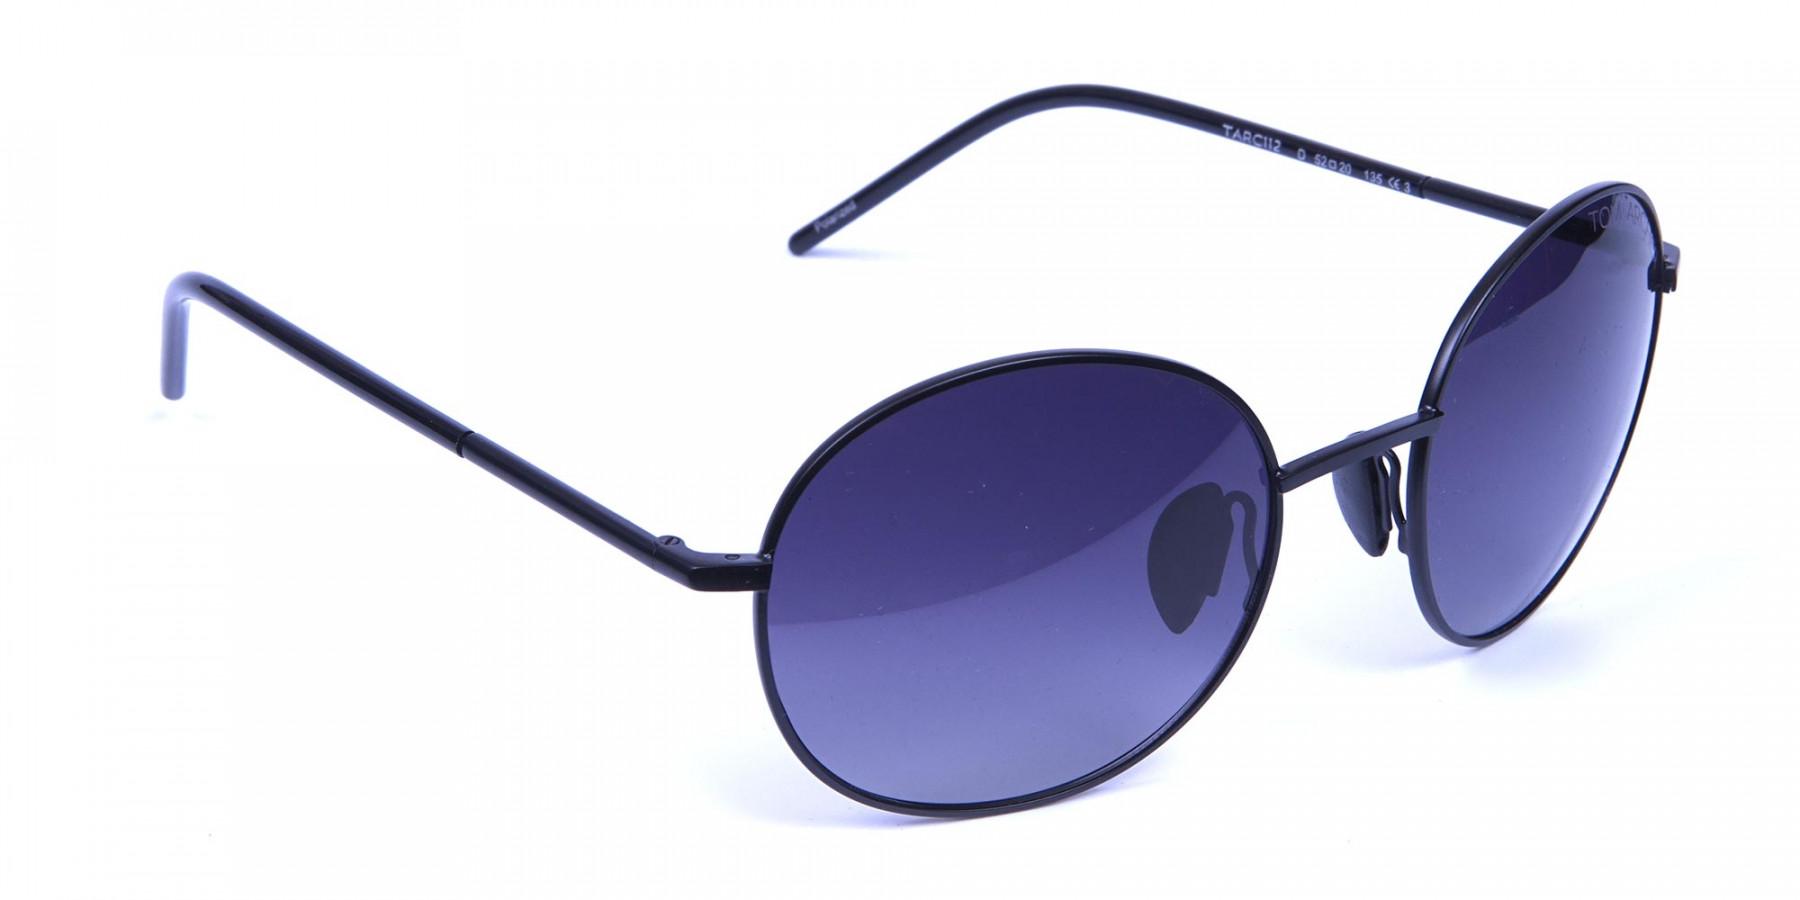 Black & Grey Sunglasses Round Frame -2